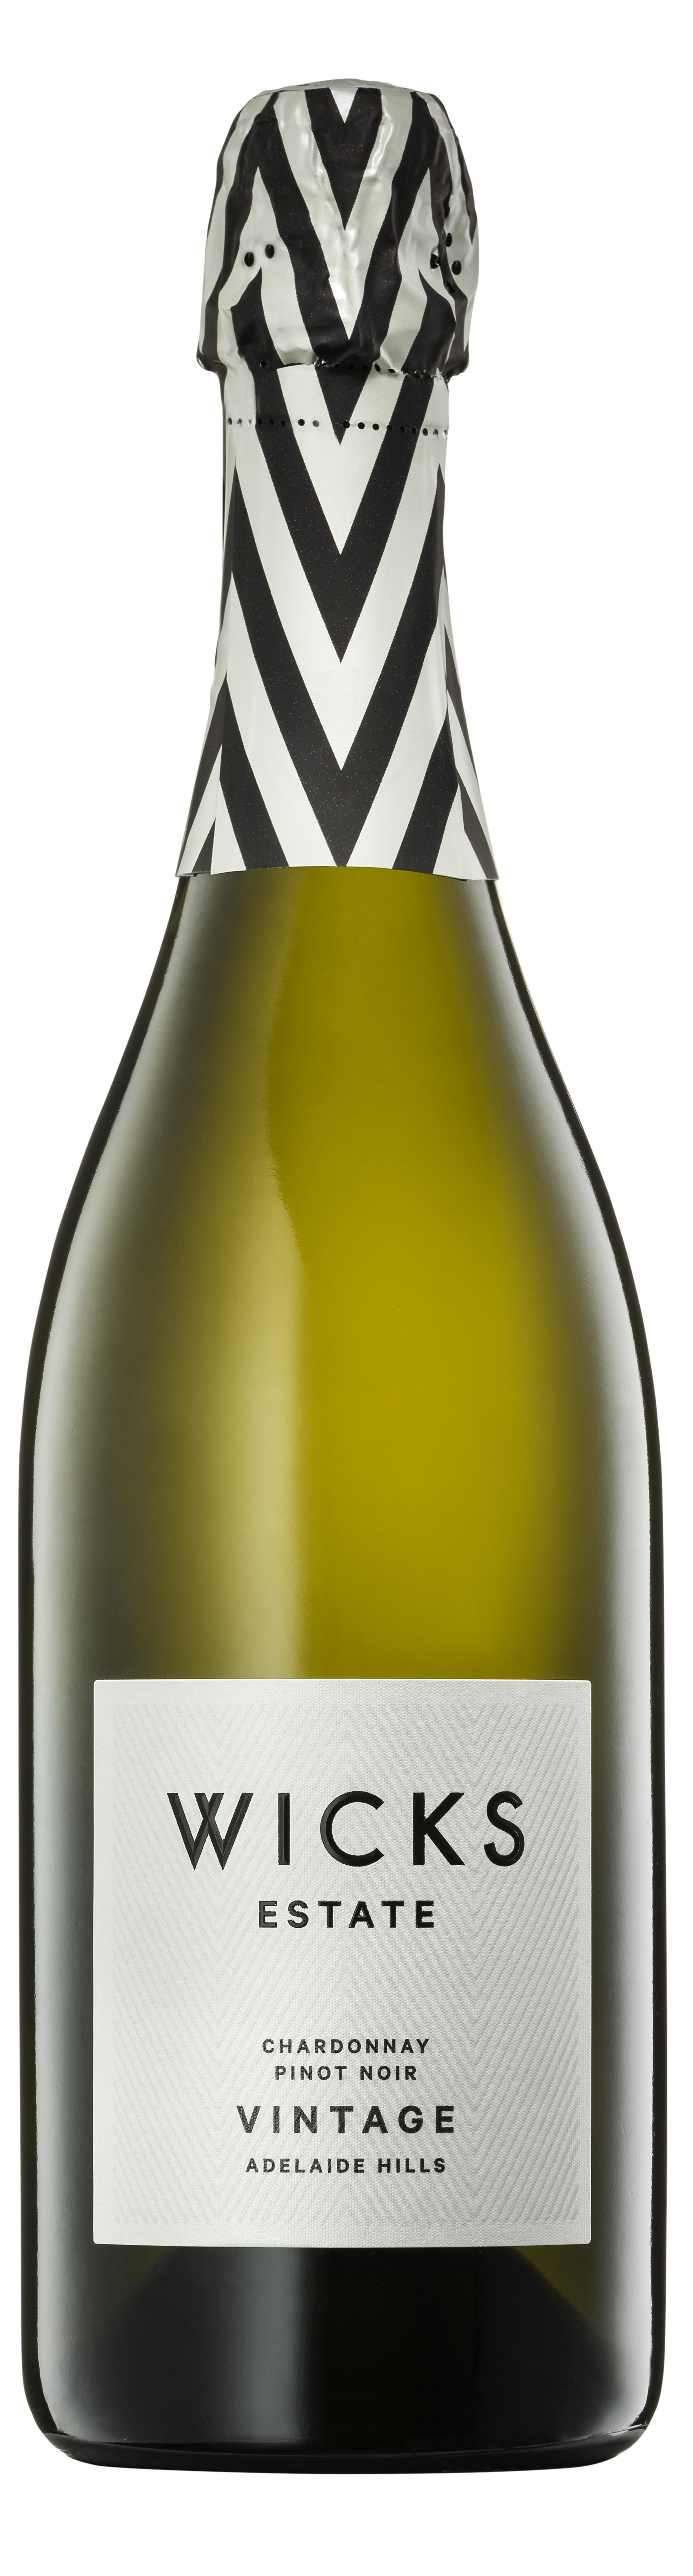 Sparkling Chardonnay Pinot Noir